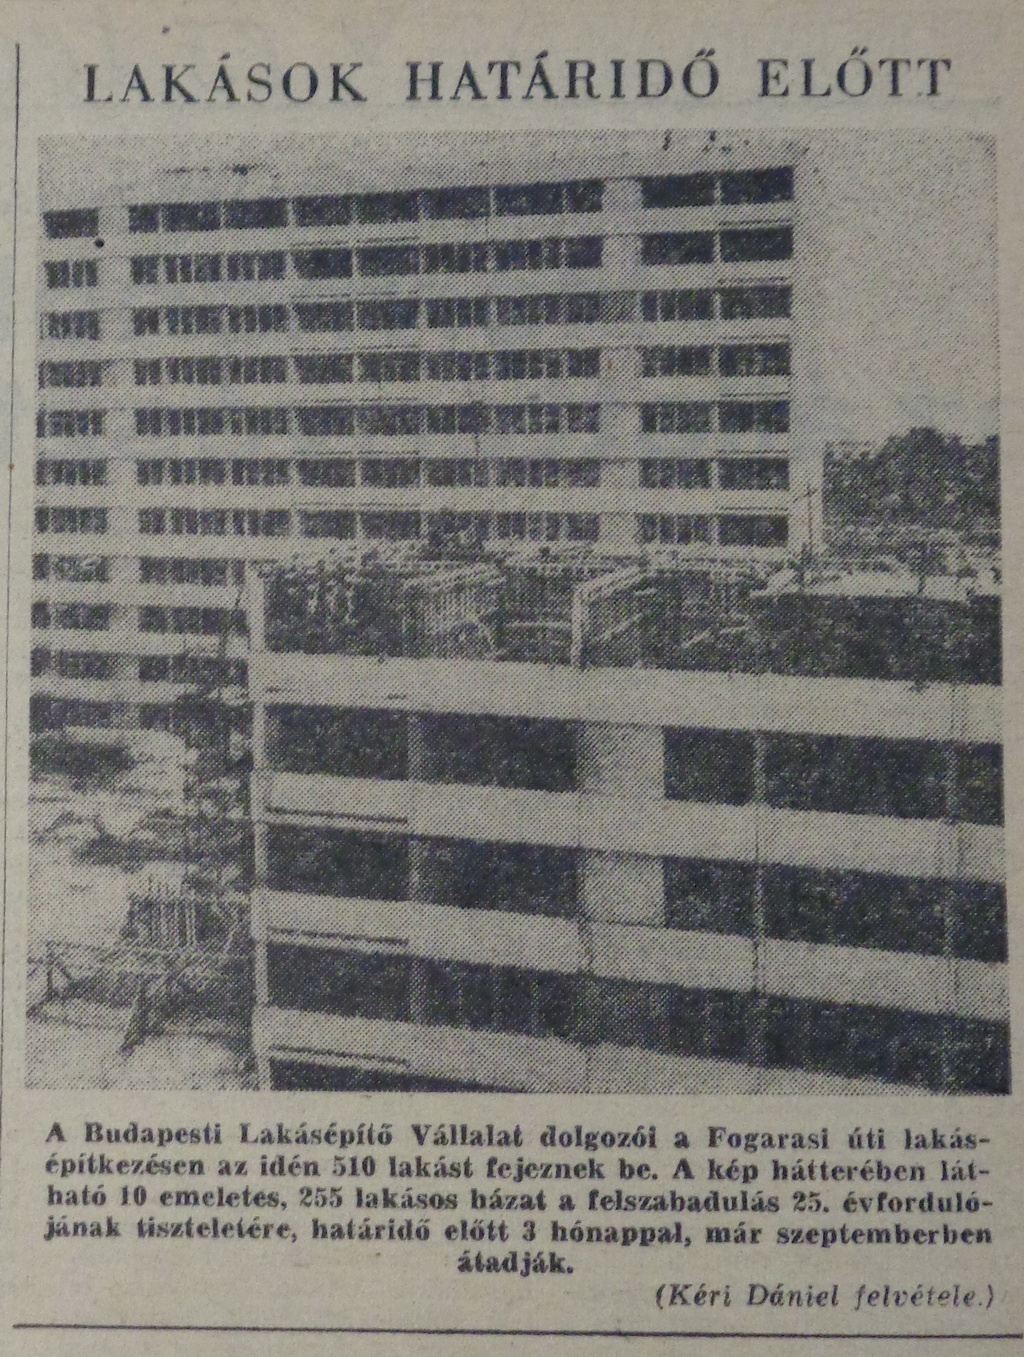 fovarosi.blog.hu: FogarasiUtiLtp-19690723-Nepszabadsag - indafoto.hu